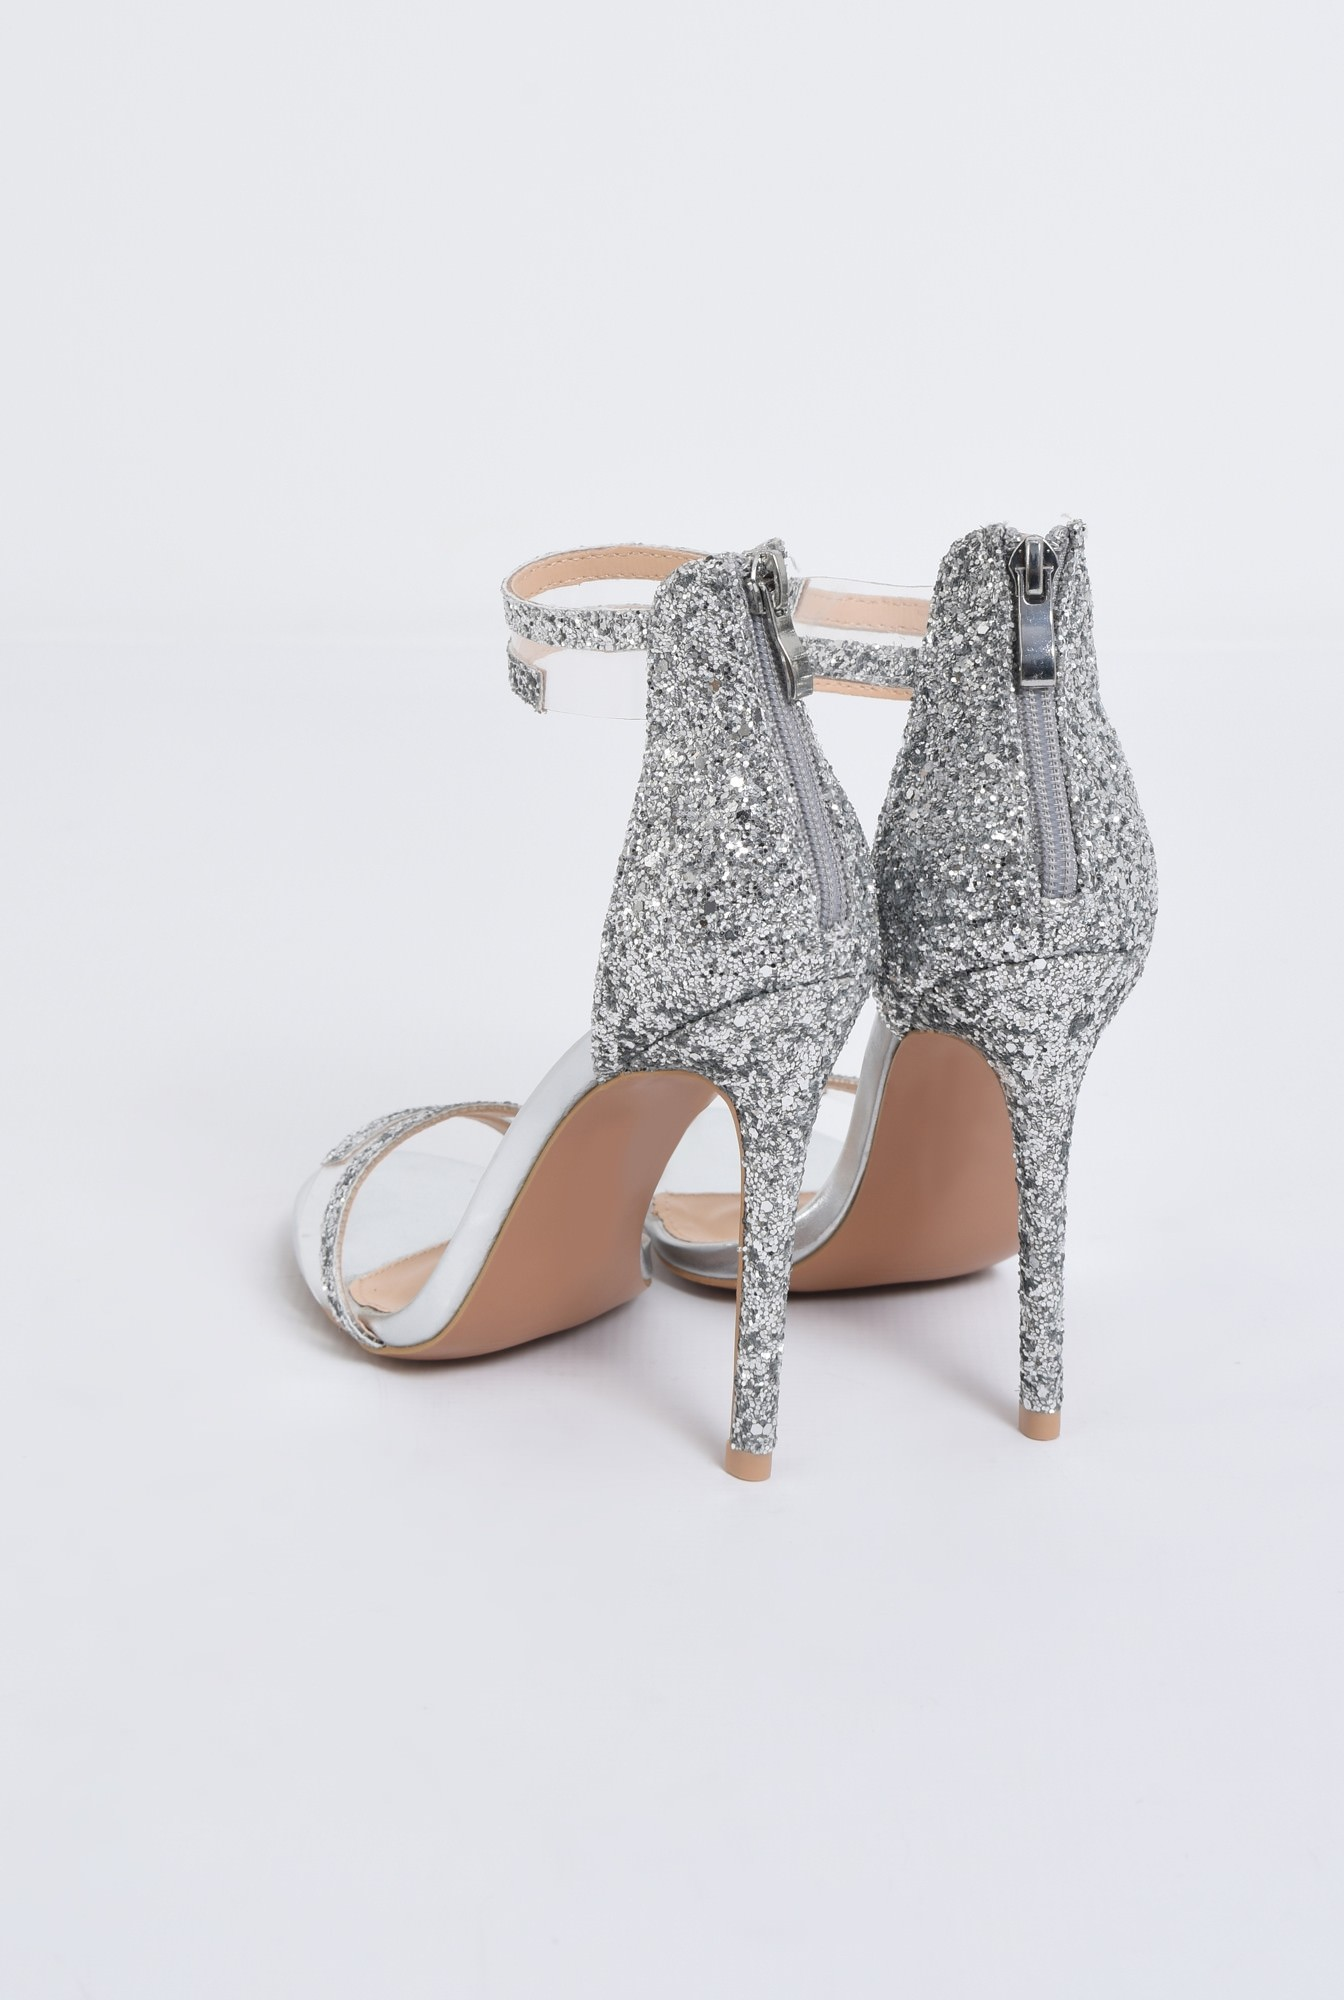 3 - sandale elegante, argintii, cu glitter, stiletto